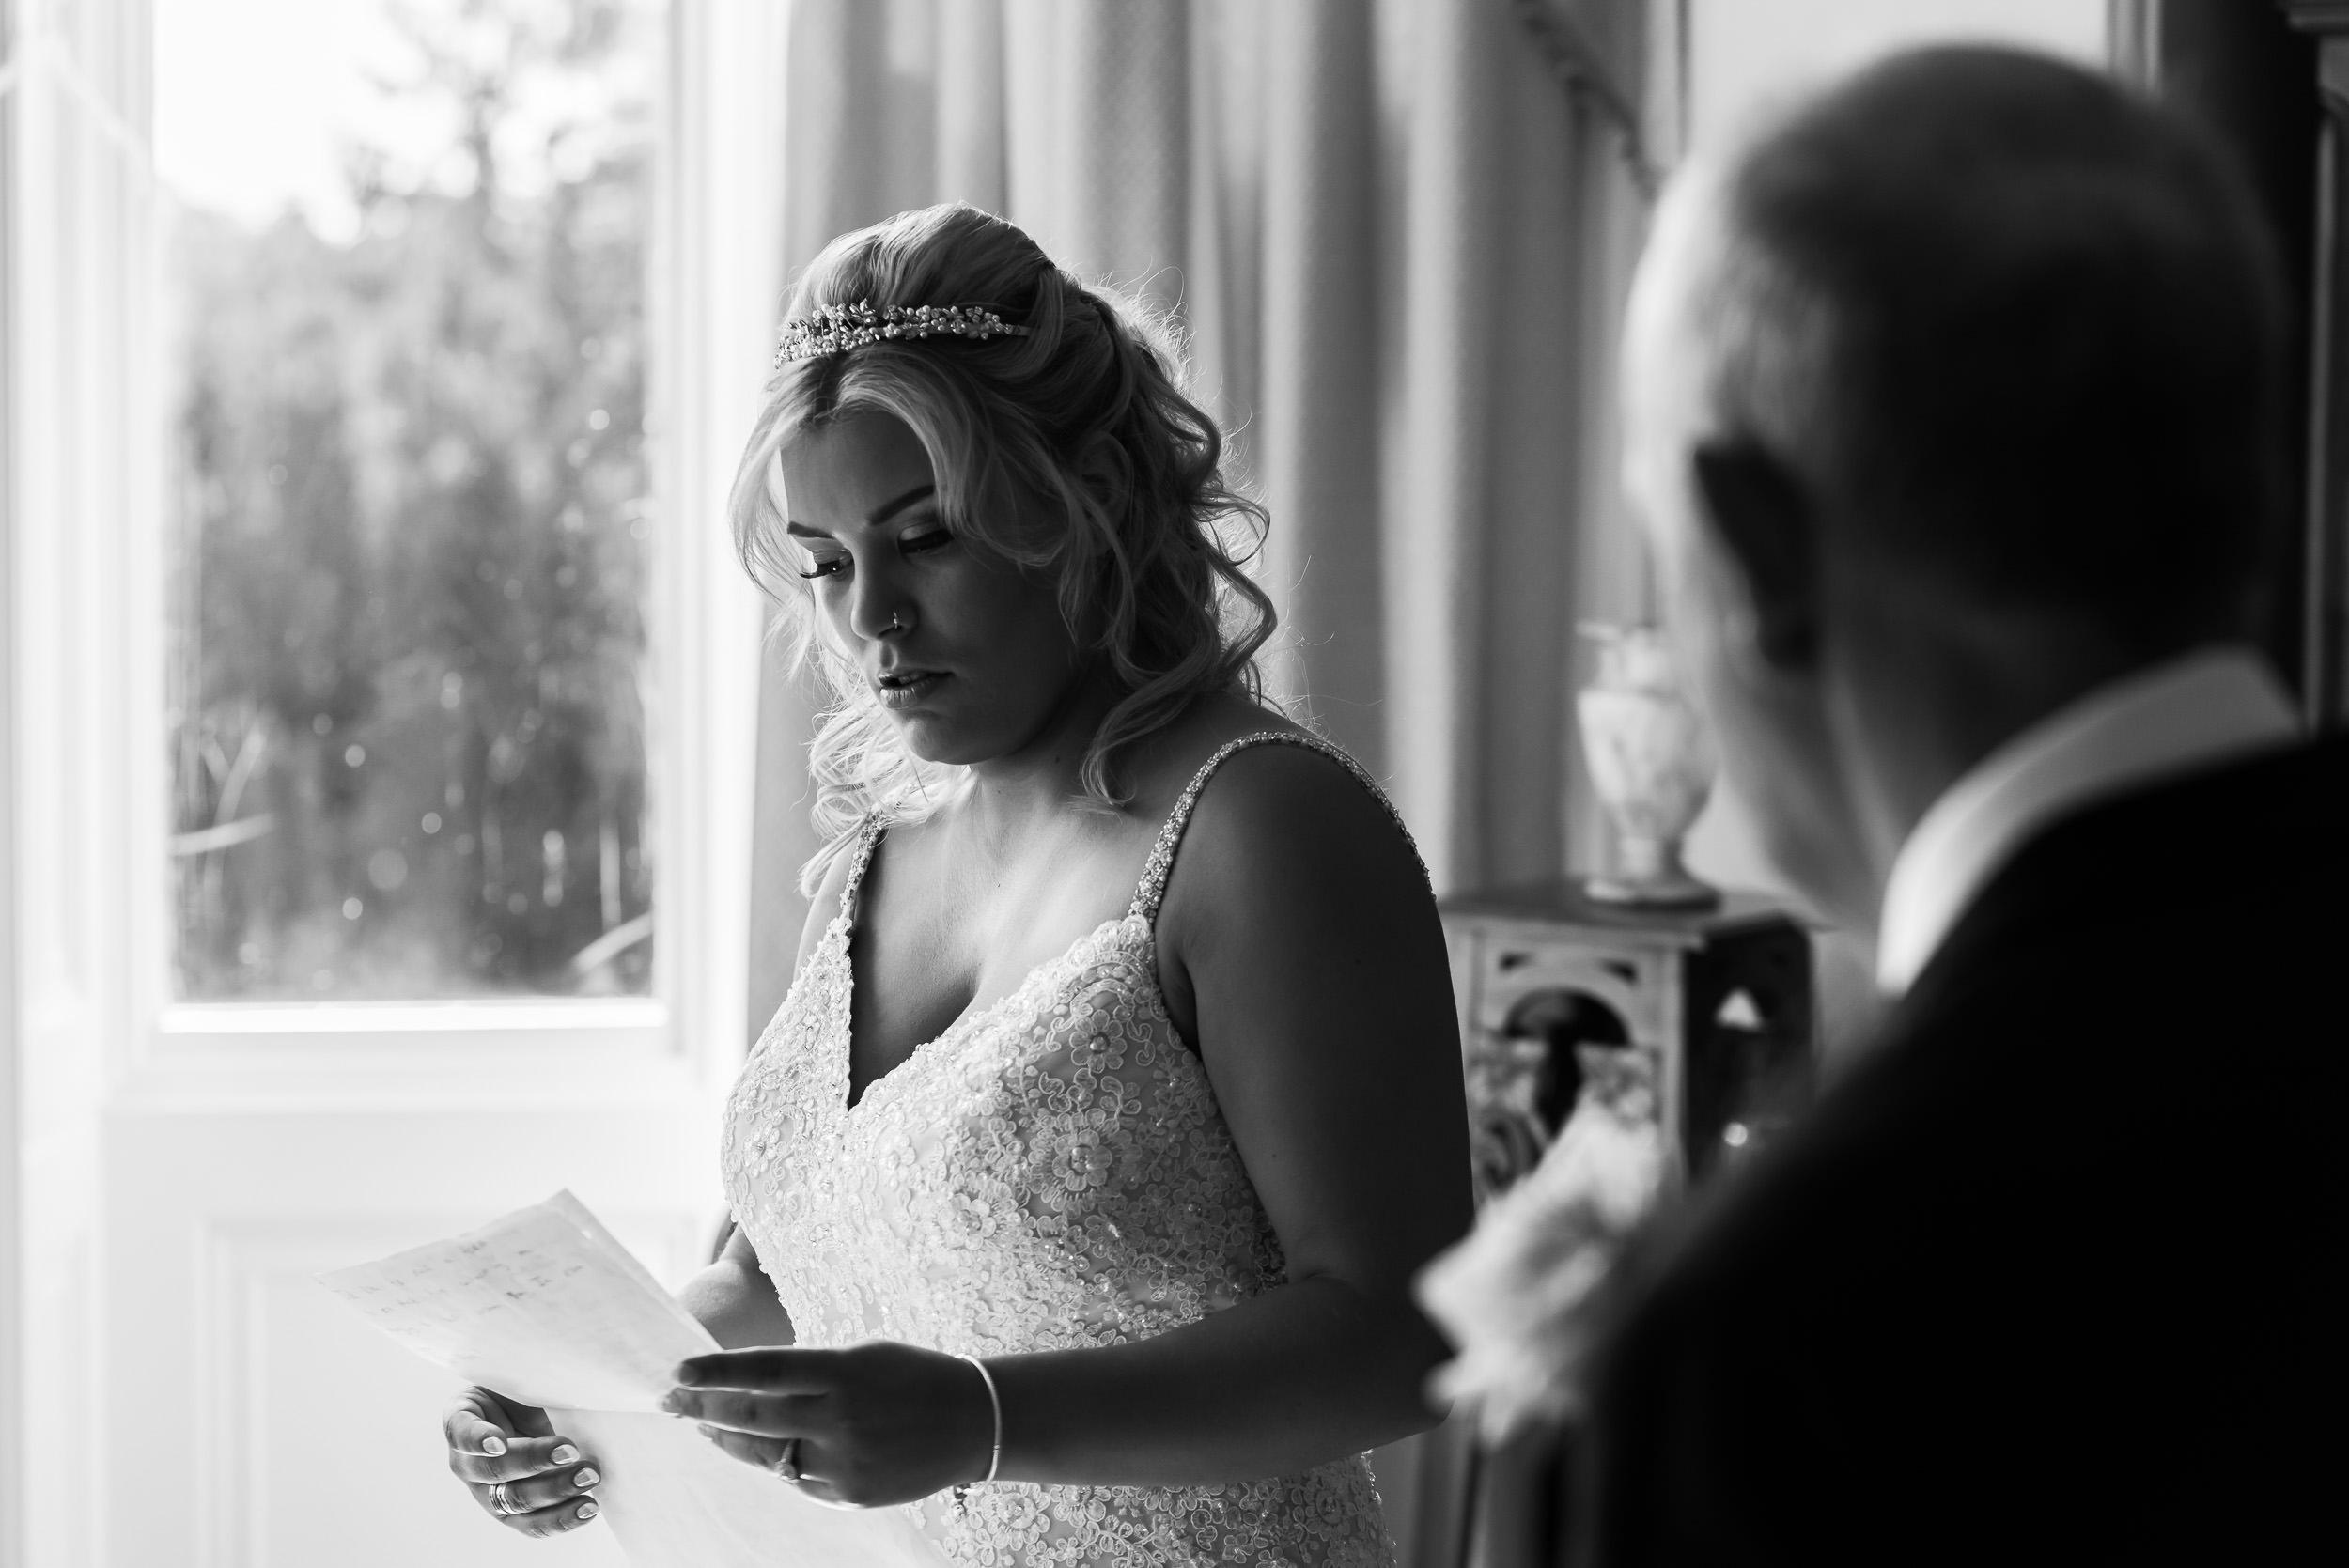 NC-20170909-2017-09-09_livvy-and-alice-wedding-0673.jpg